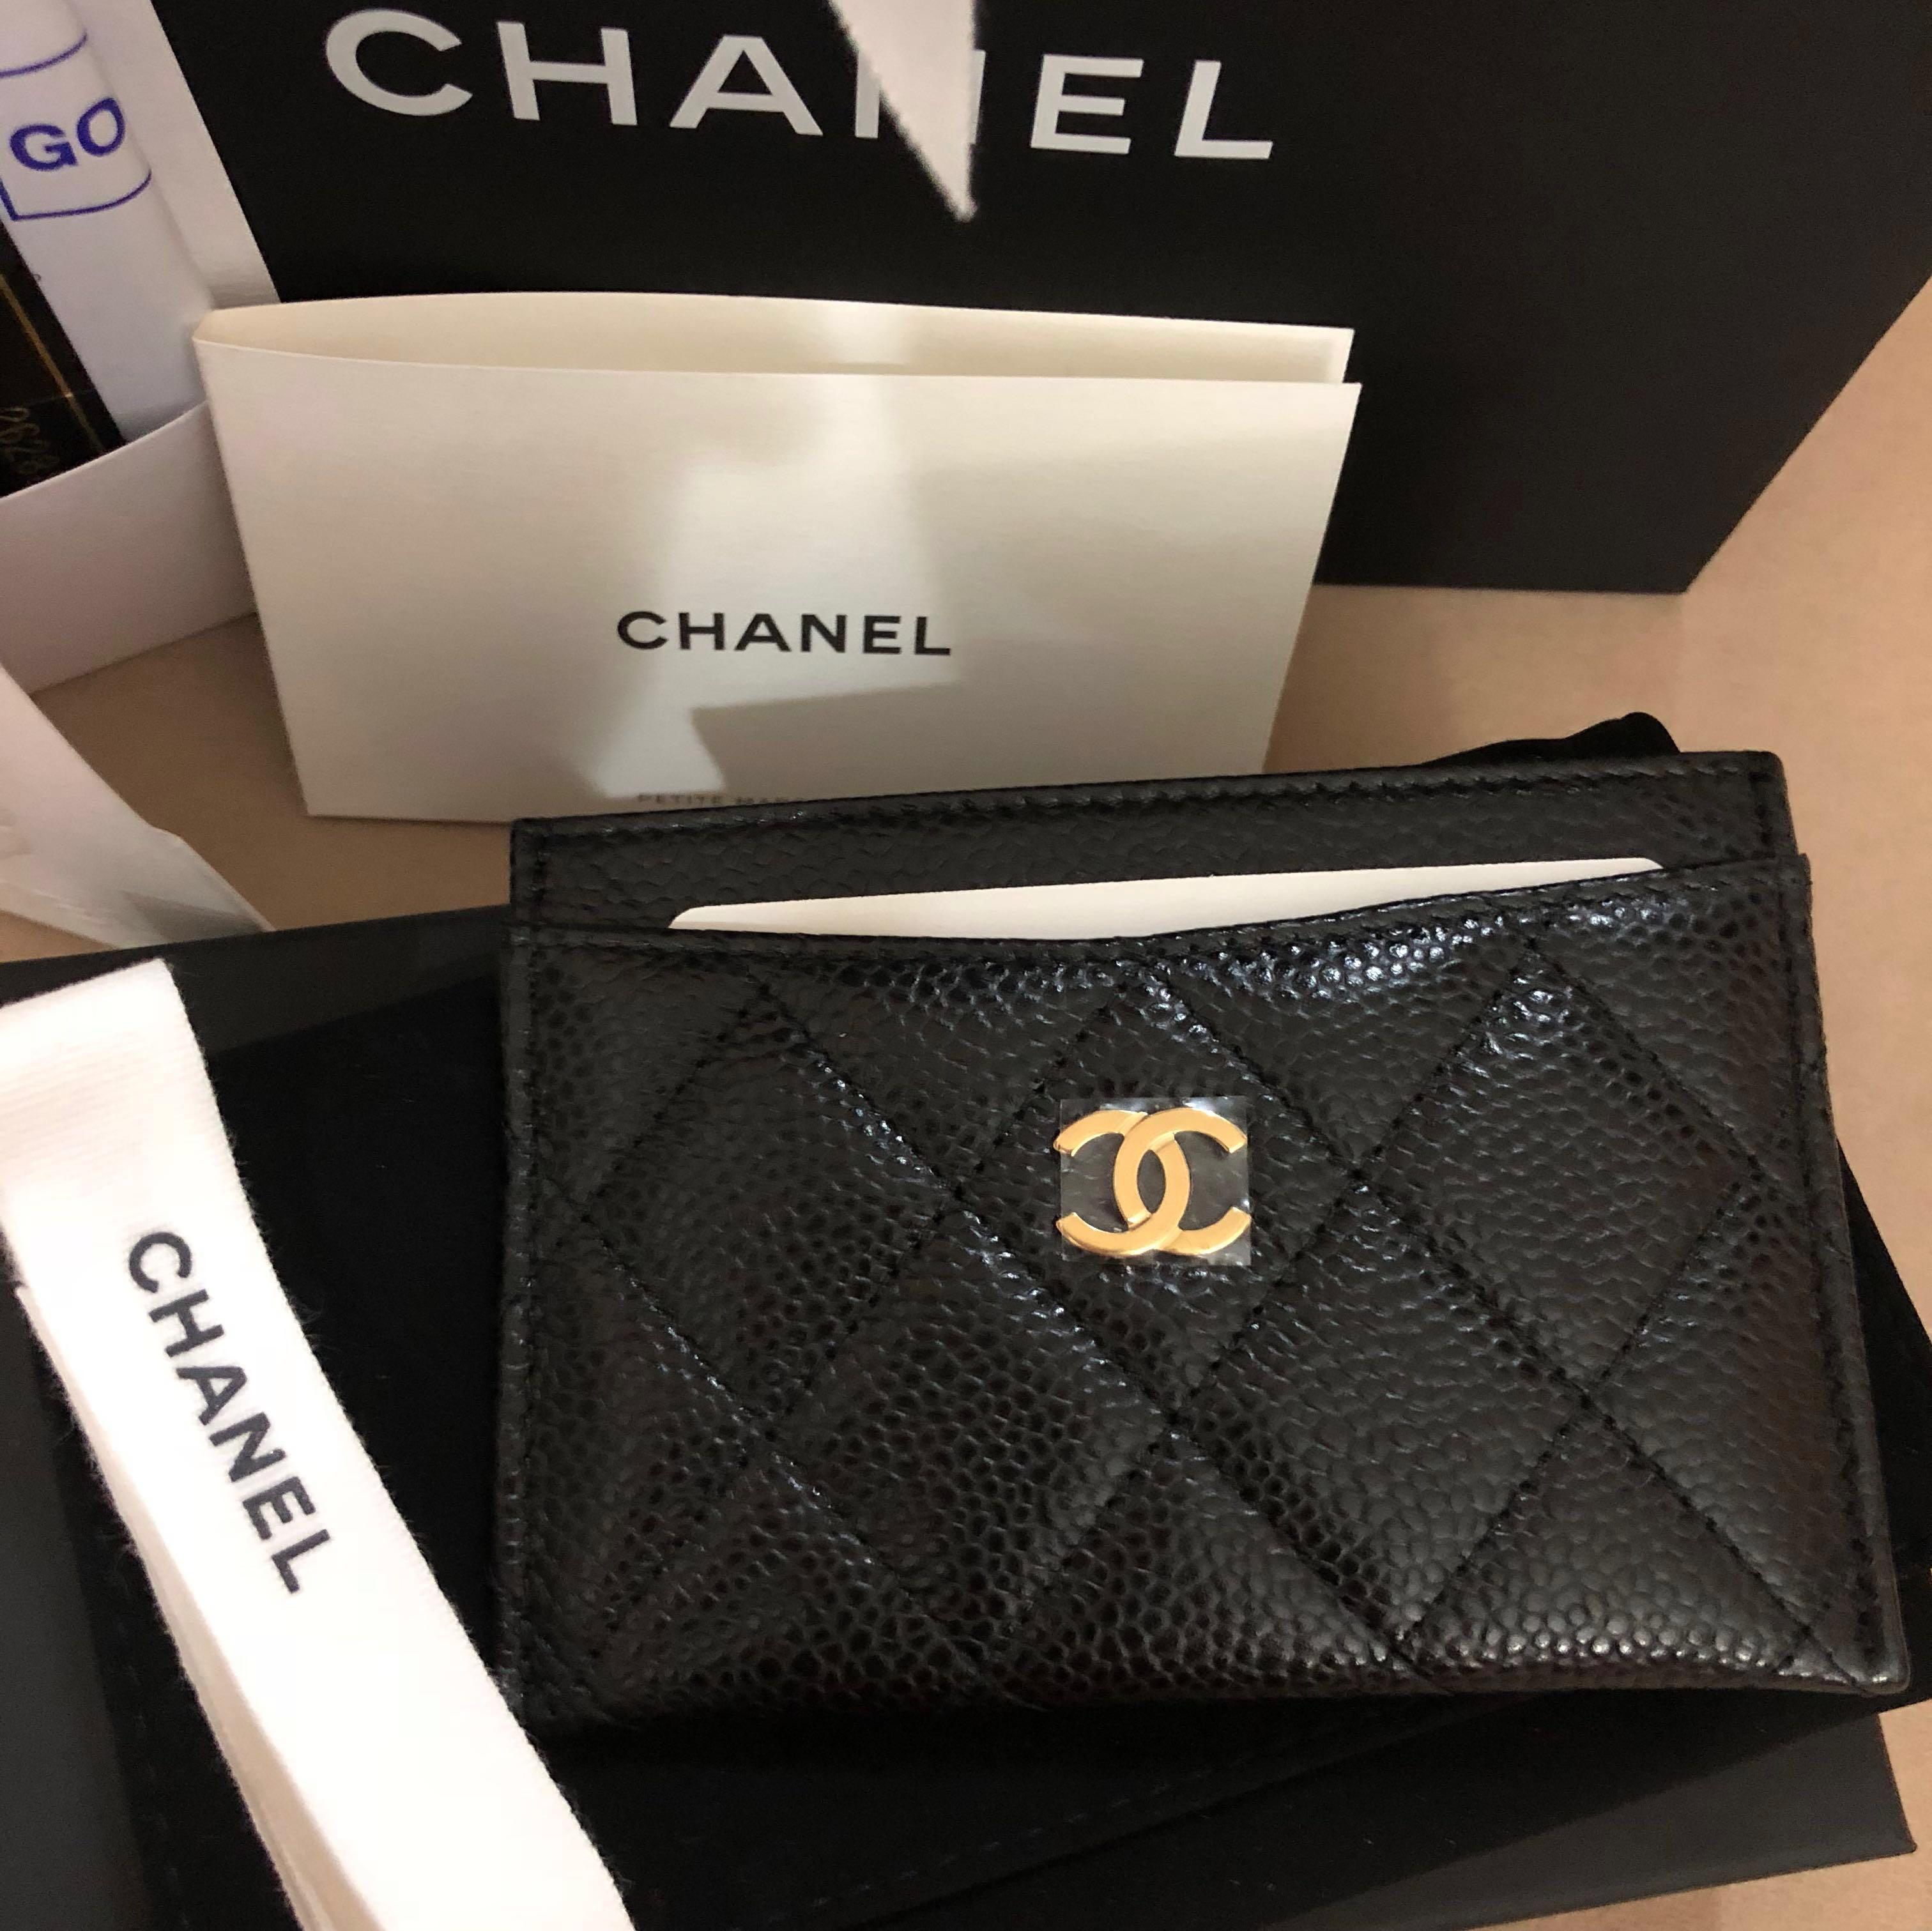 42893de64dd1 Chanel Classic Card Holder, Luxury, Bags & Wallets, Wallets on Carousell